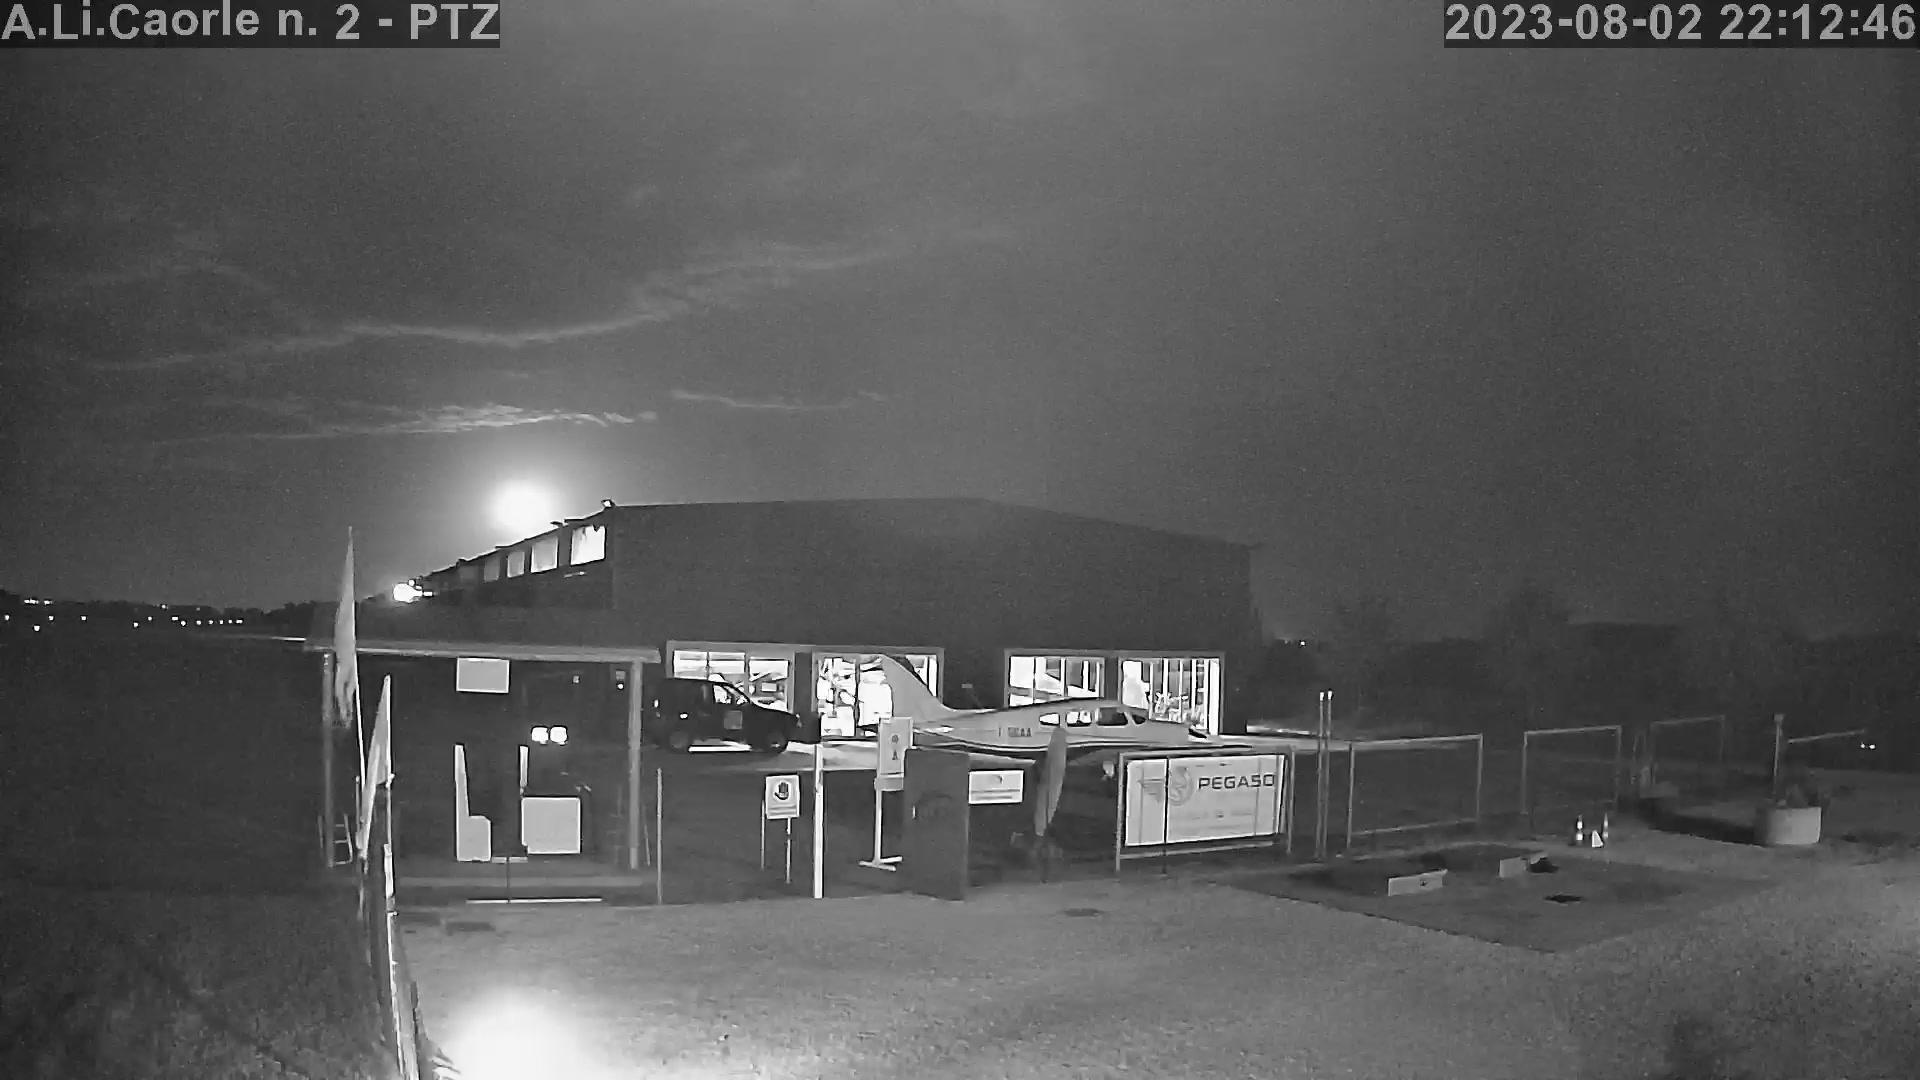 Webcam Caorle › East: Aviosuperficie del Litorale di Caor